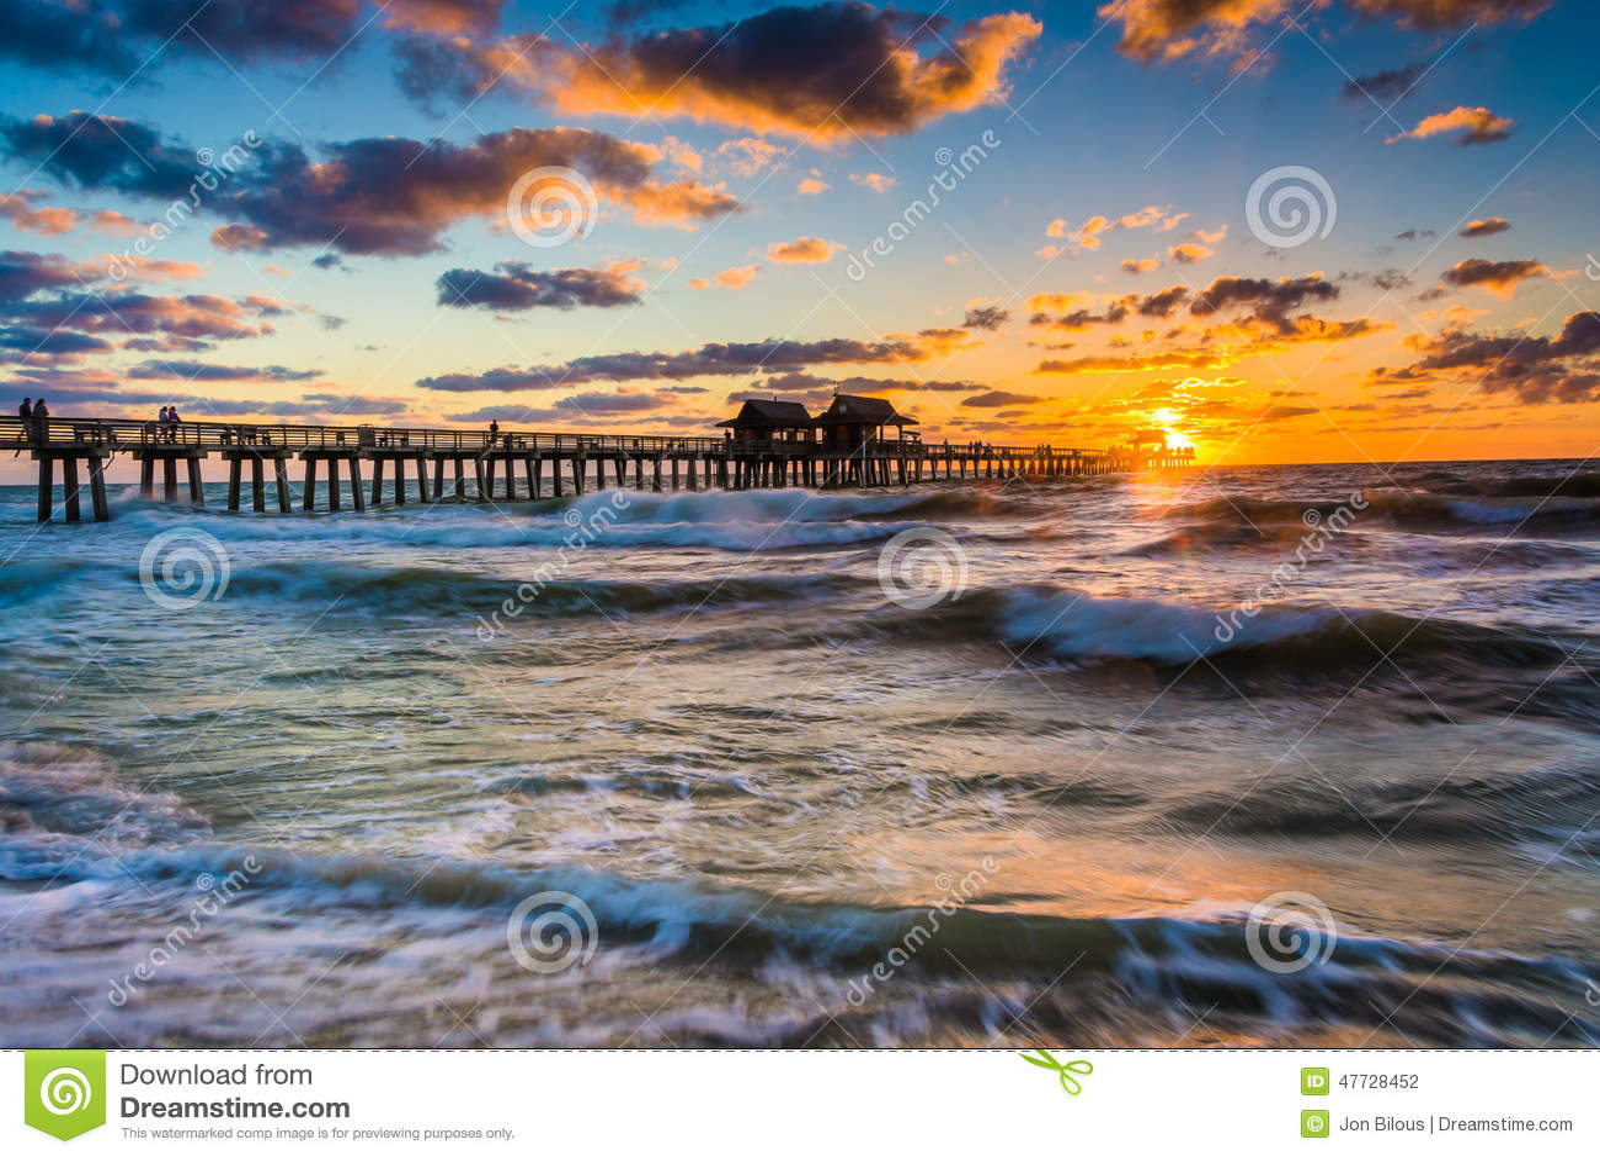 Stock Photo Sunset Over Fishing Pier Gulf Mexico Naples Flori Florida Image47728452 on Naples Florida Pier Sunset